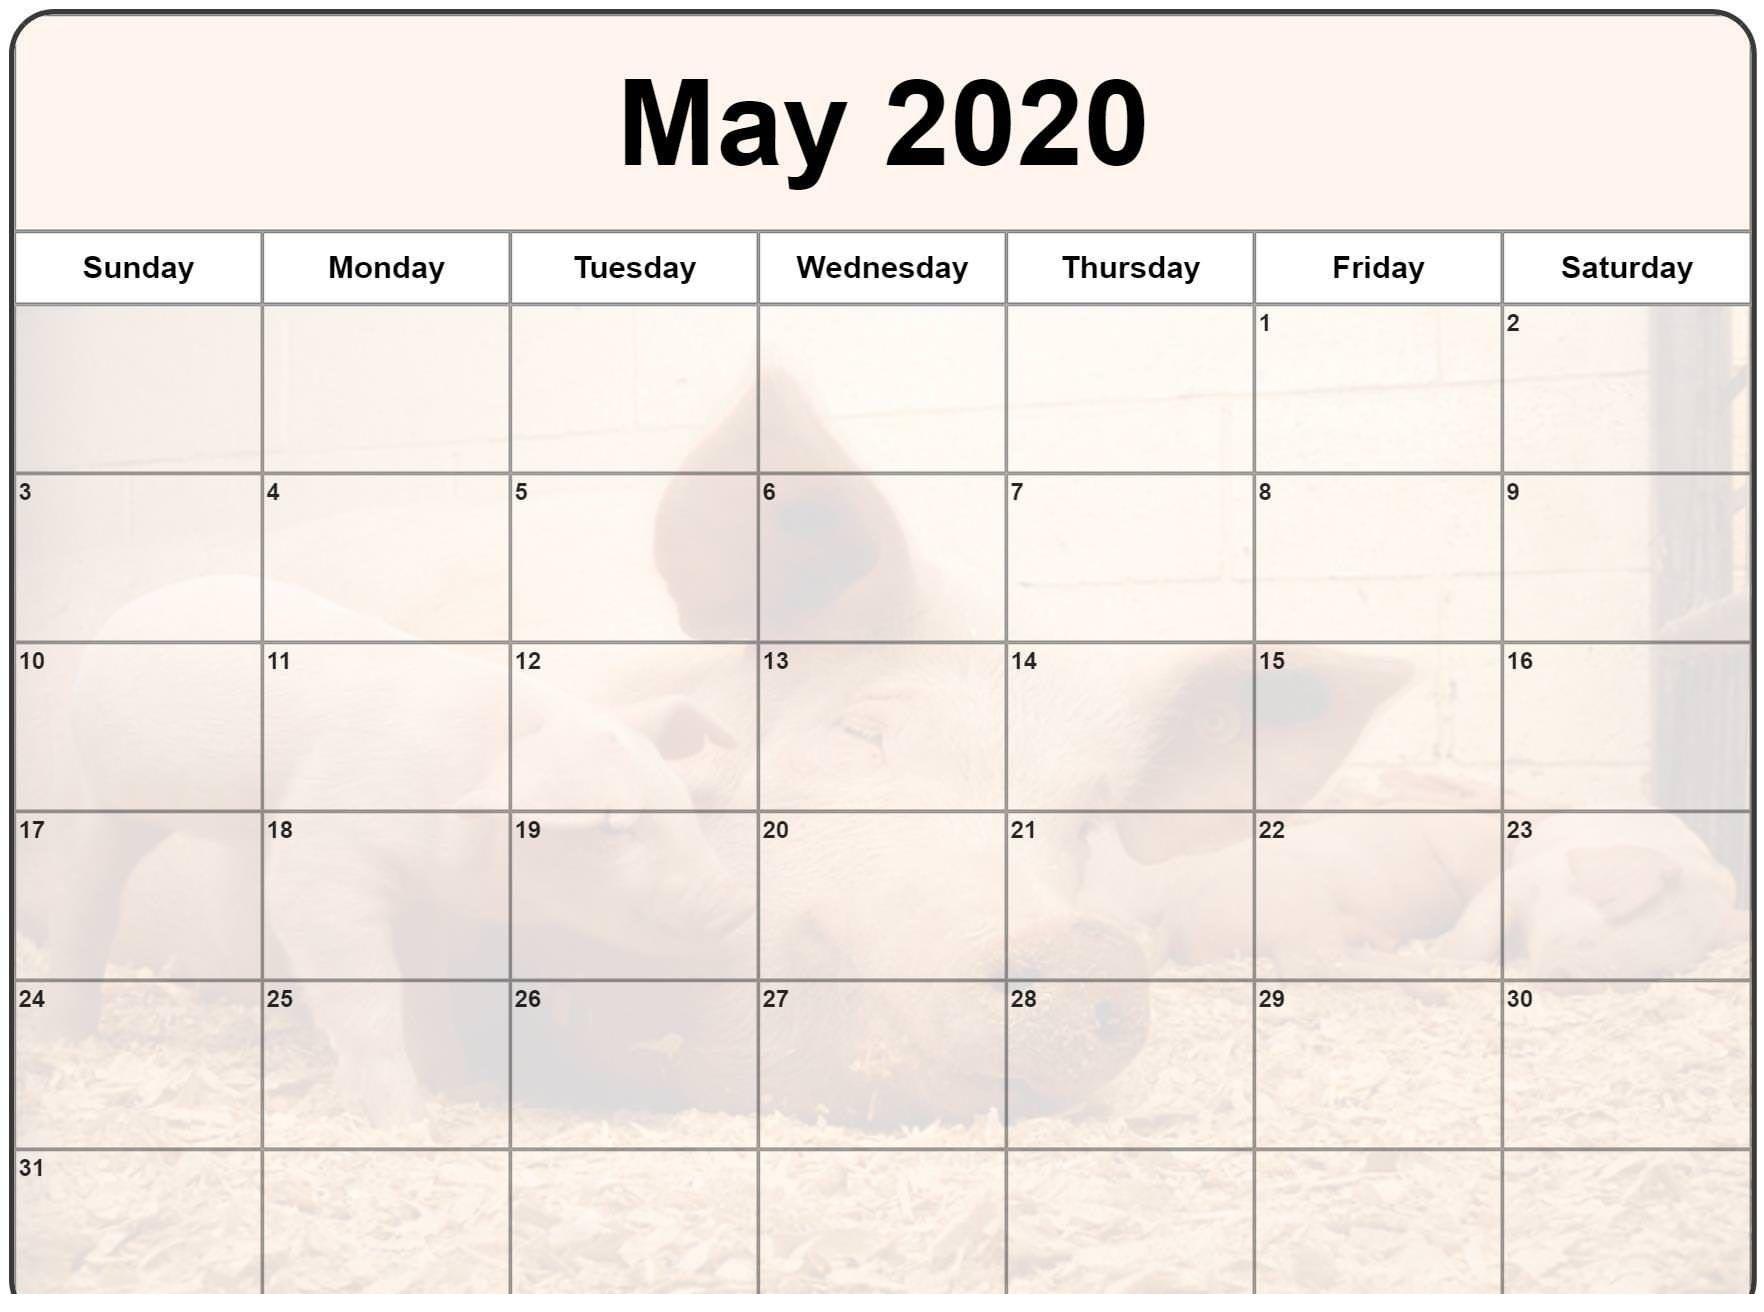 May 2020 Blank Calendar